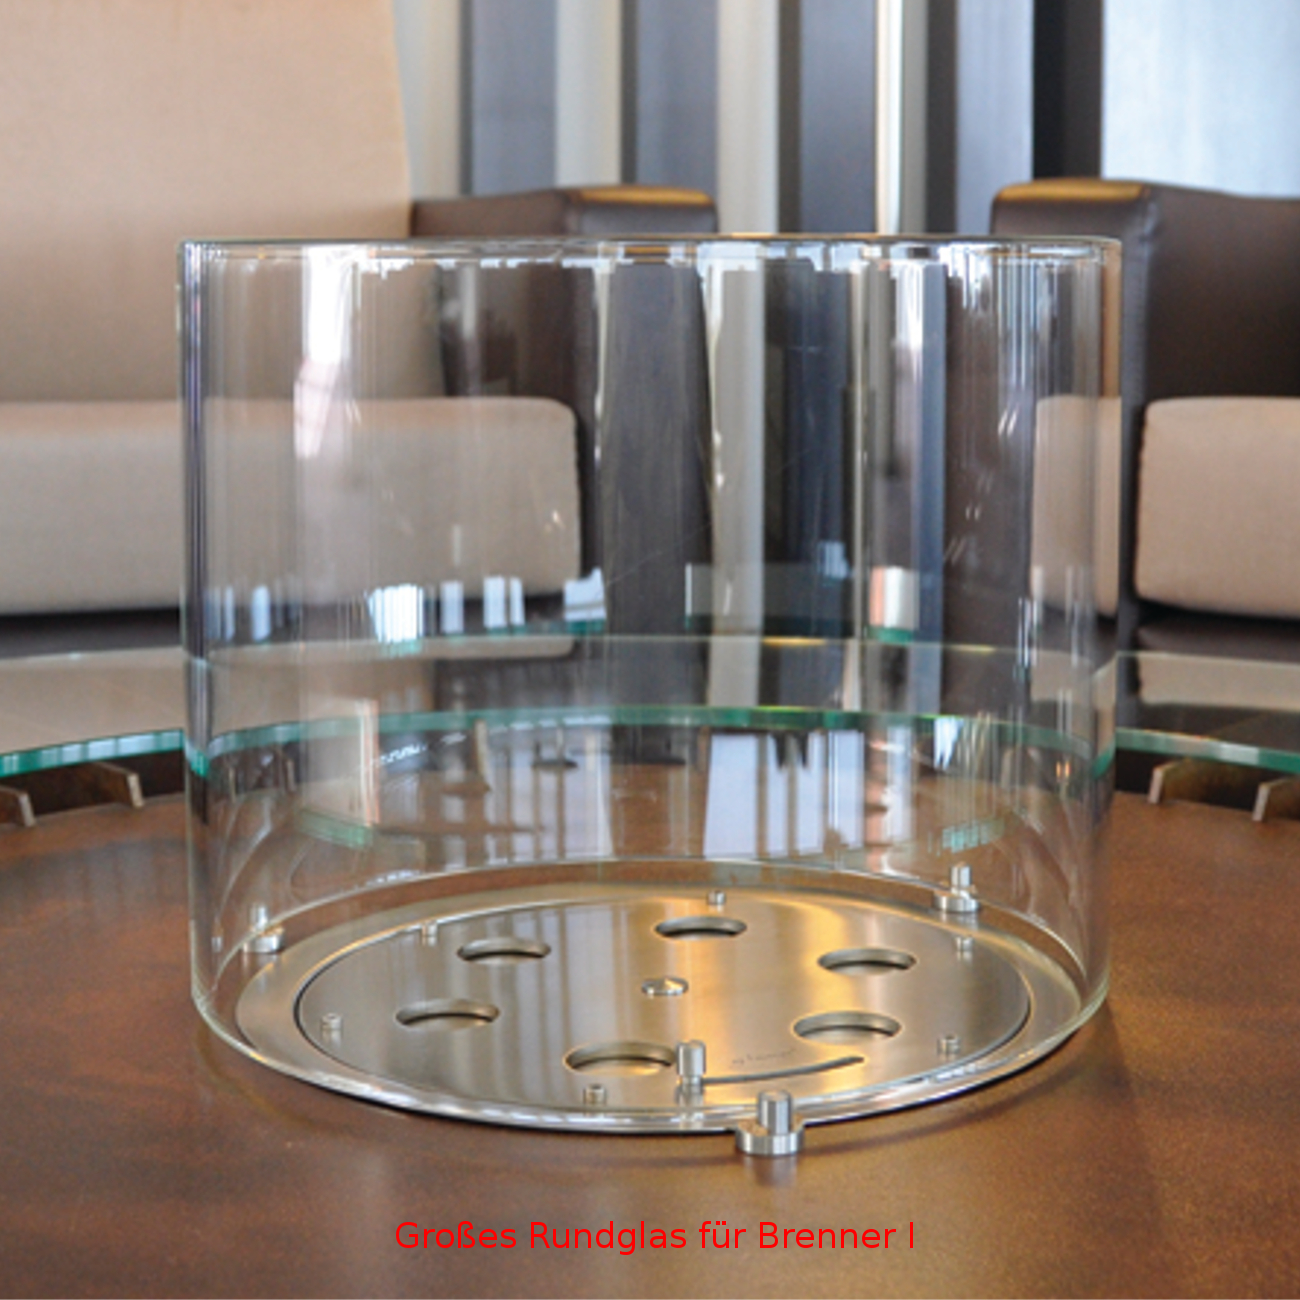 burner-I-rundglas-gross